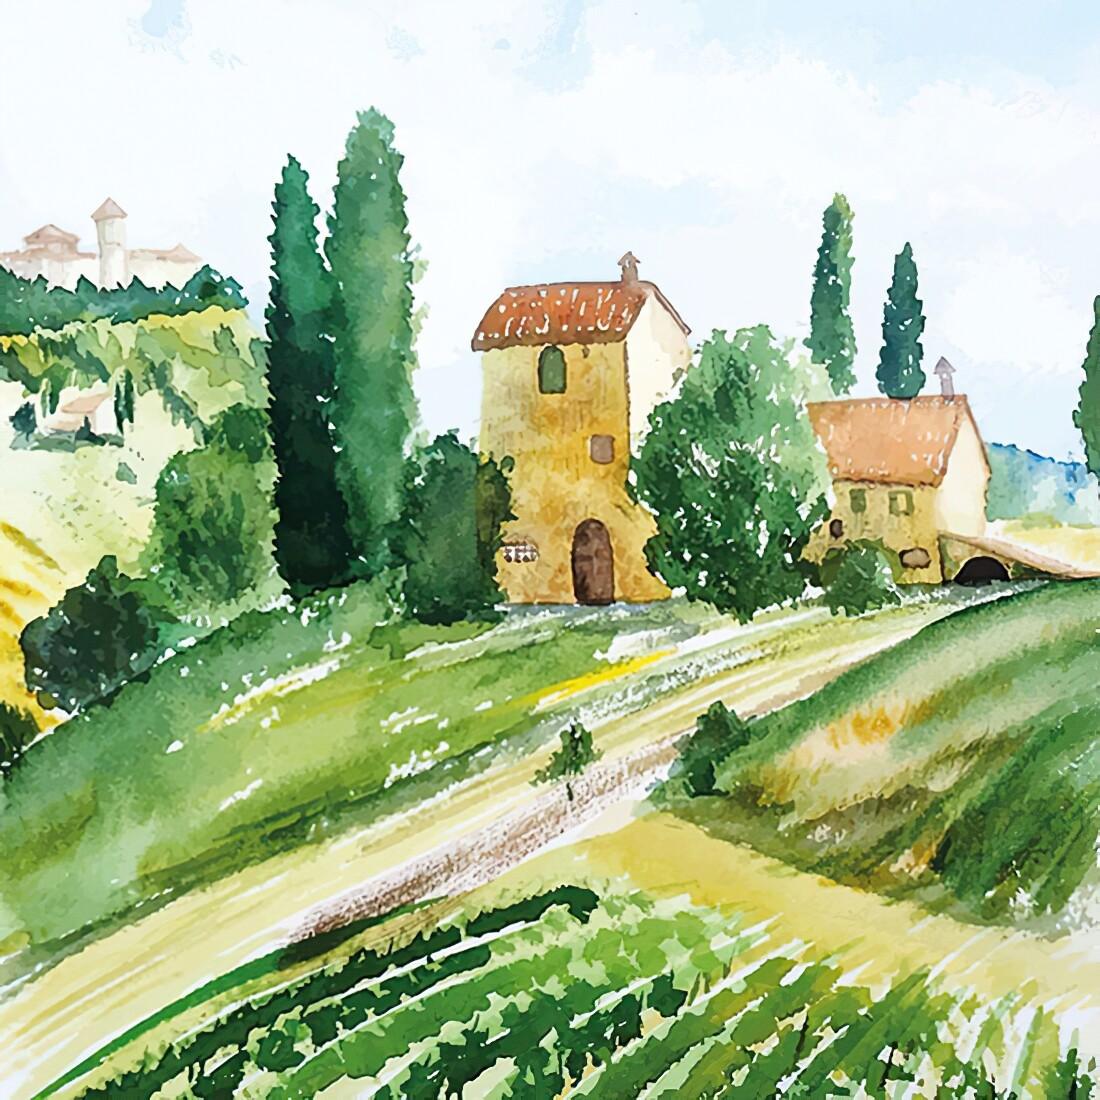 Decoupage Paper Napkins - Outdoor/Scenic - Tuscany Watercolour 13x13 (1 Sheet)